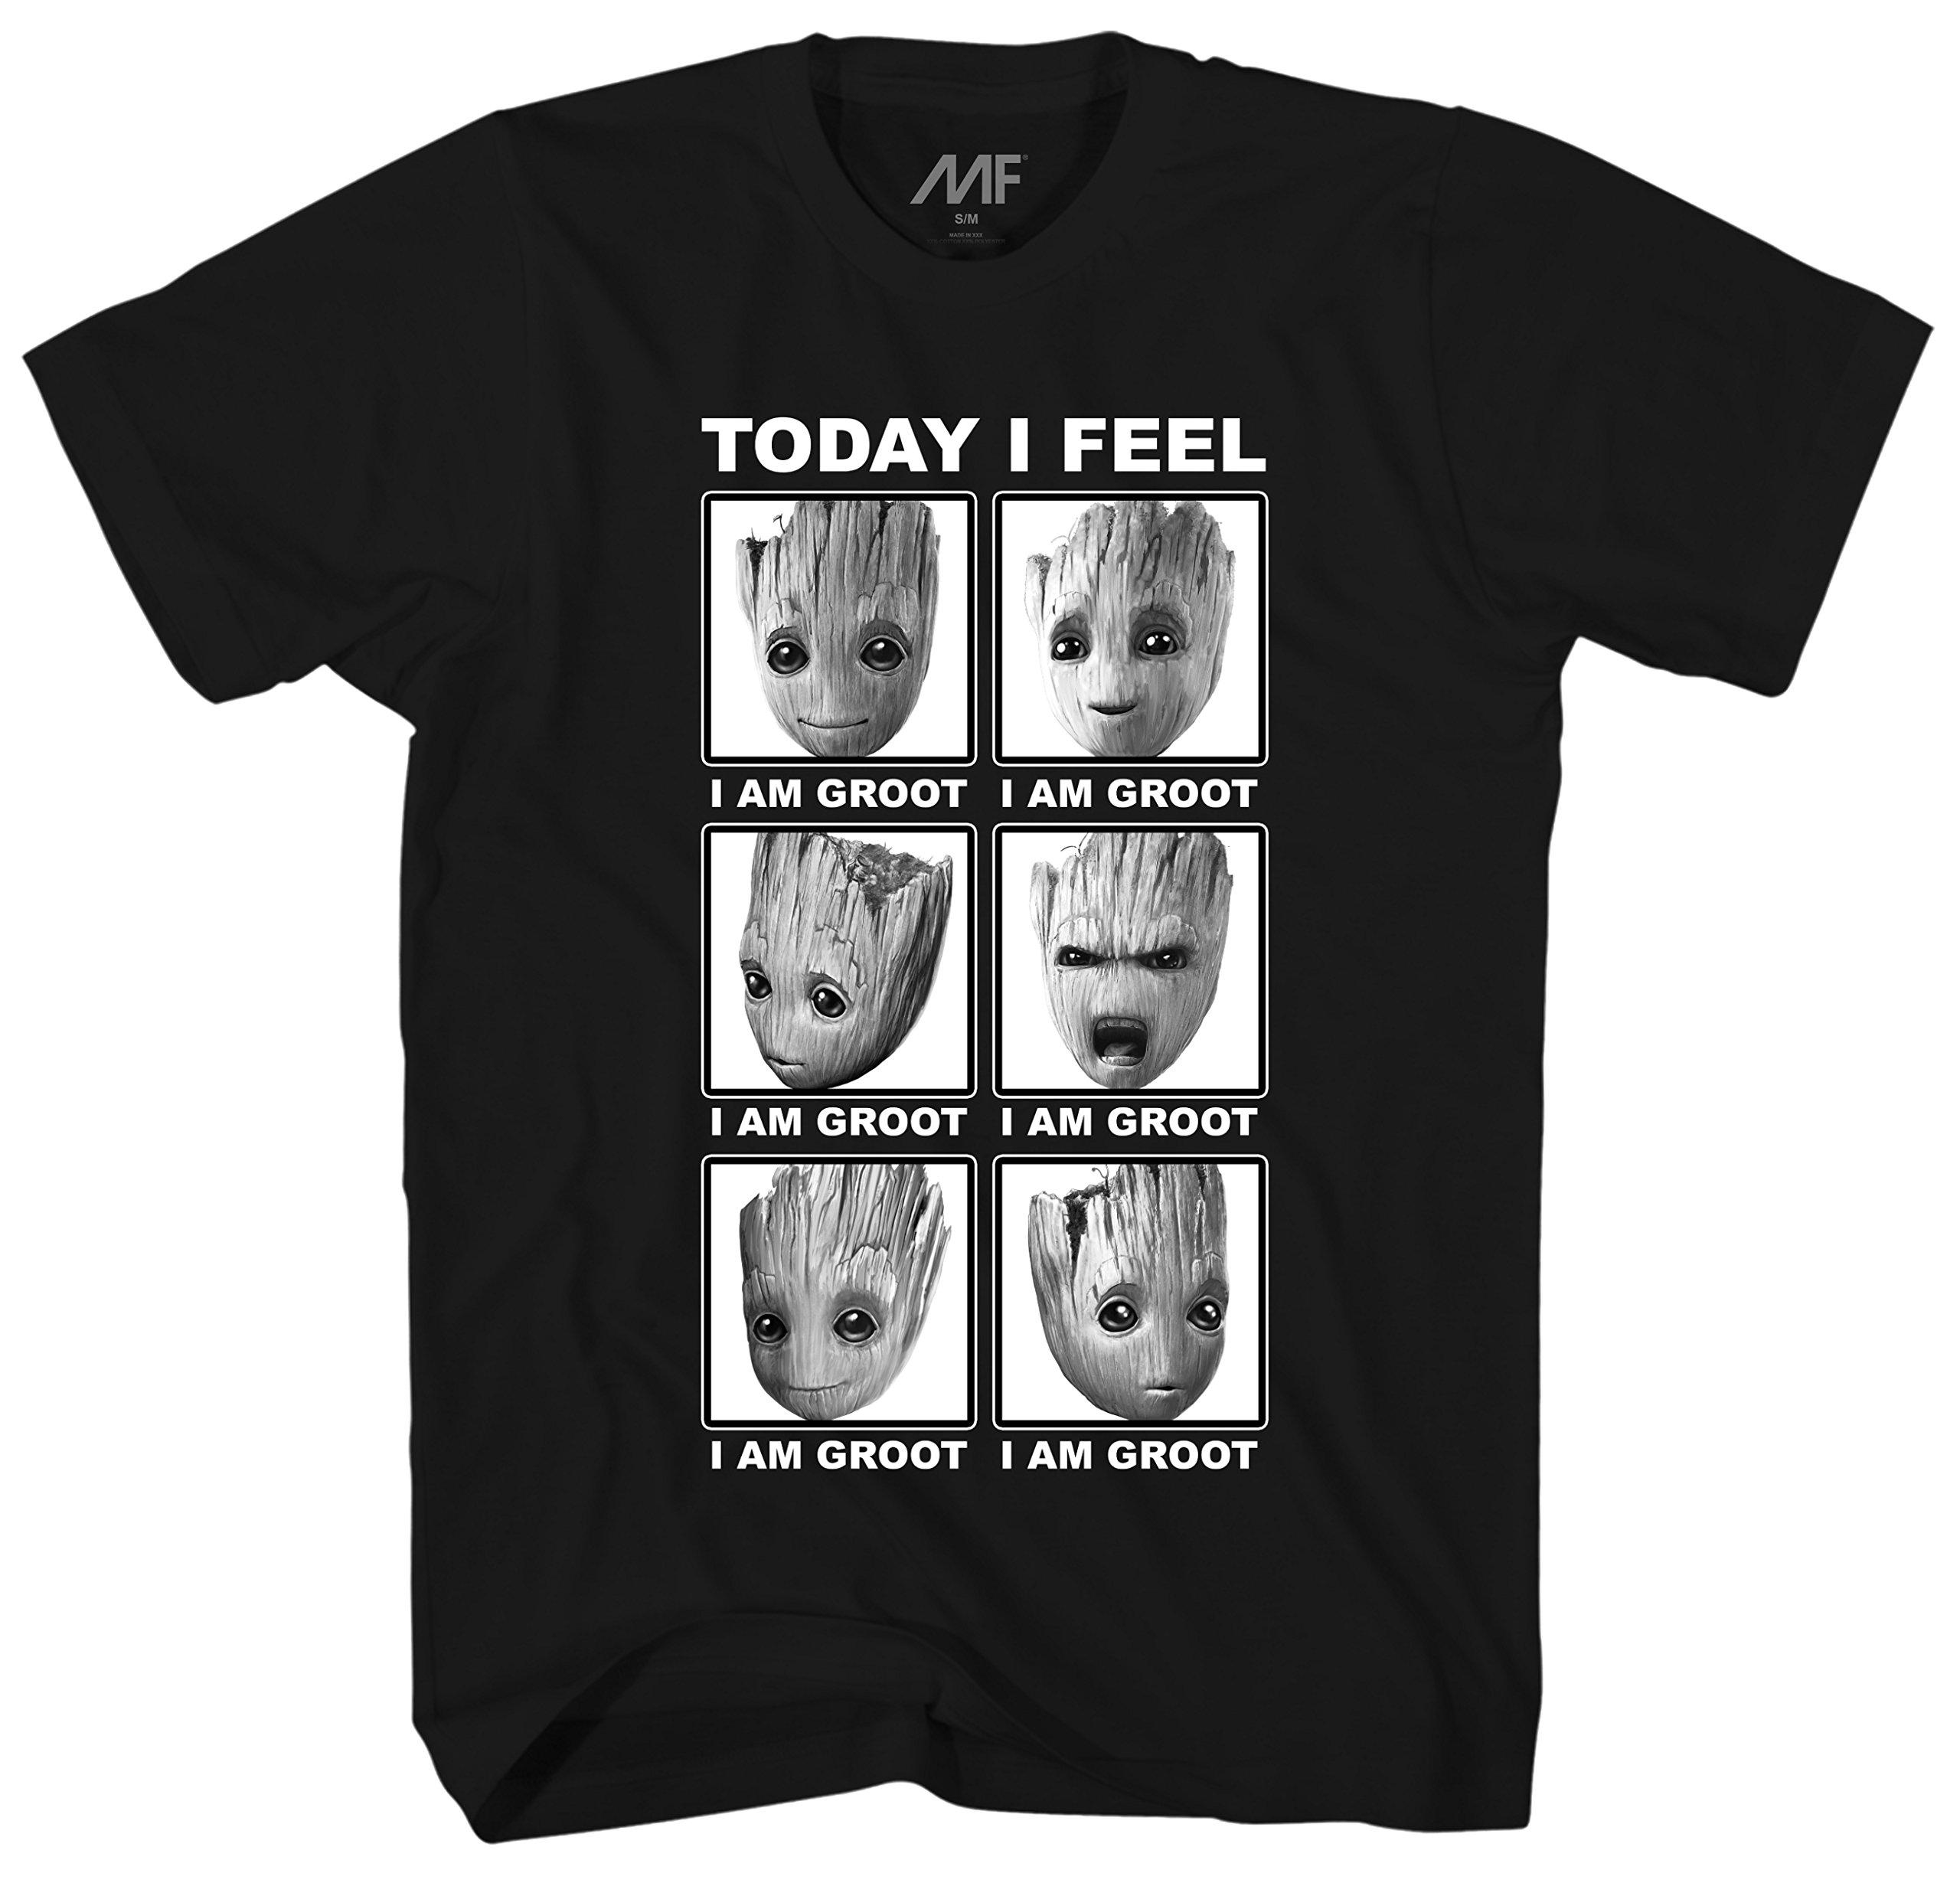 Marvel Guardians of The Galaxy 2 Face of Groot I Feel T-Shirt (Medium, Black)